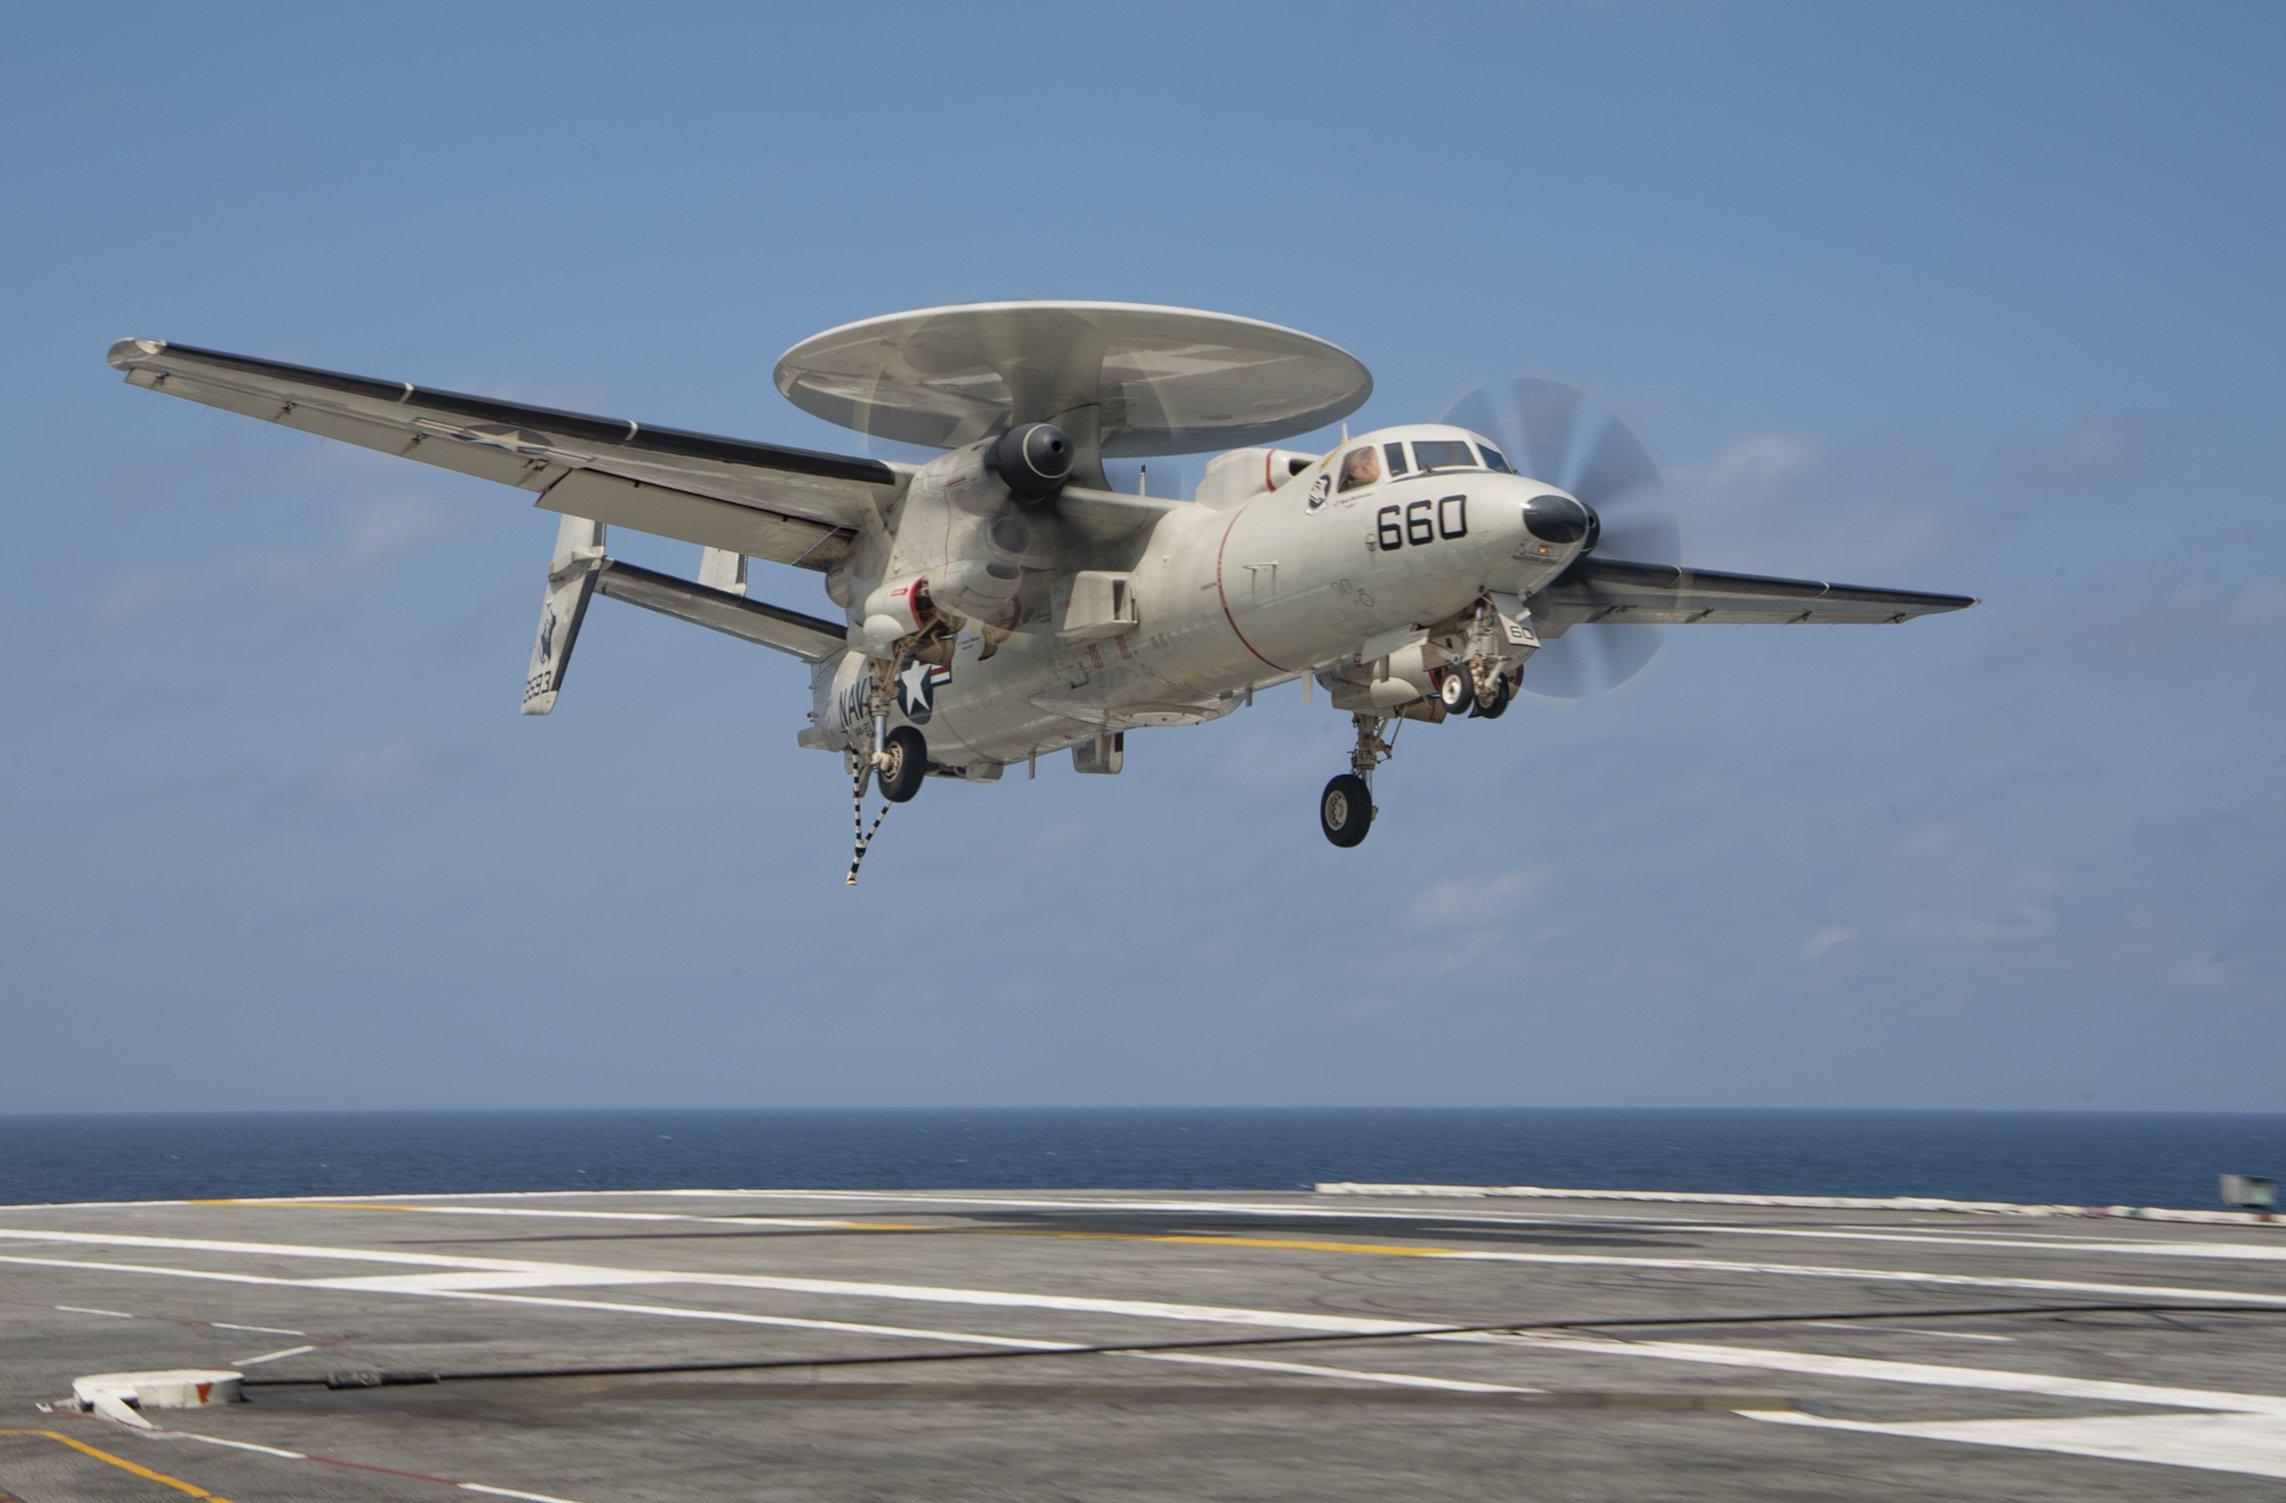 E-2D Advanced Hawkeye [US Navy/Mass Communication Specialist 3rd Class Kelsey Trinh]